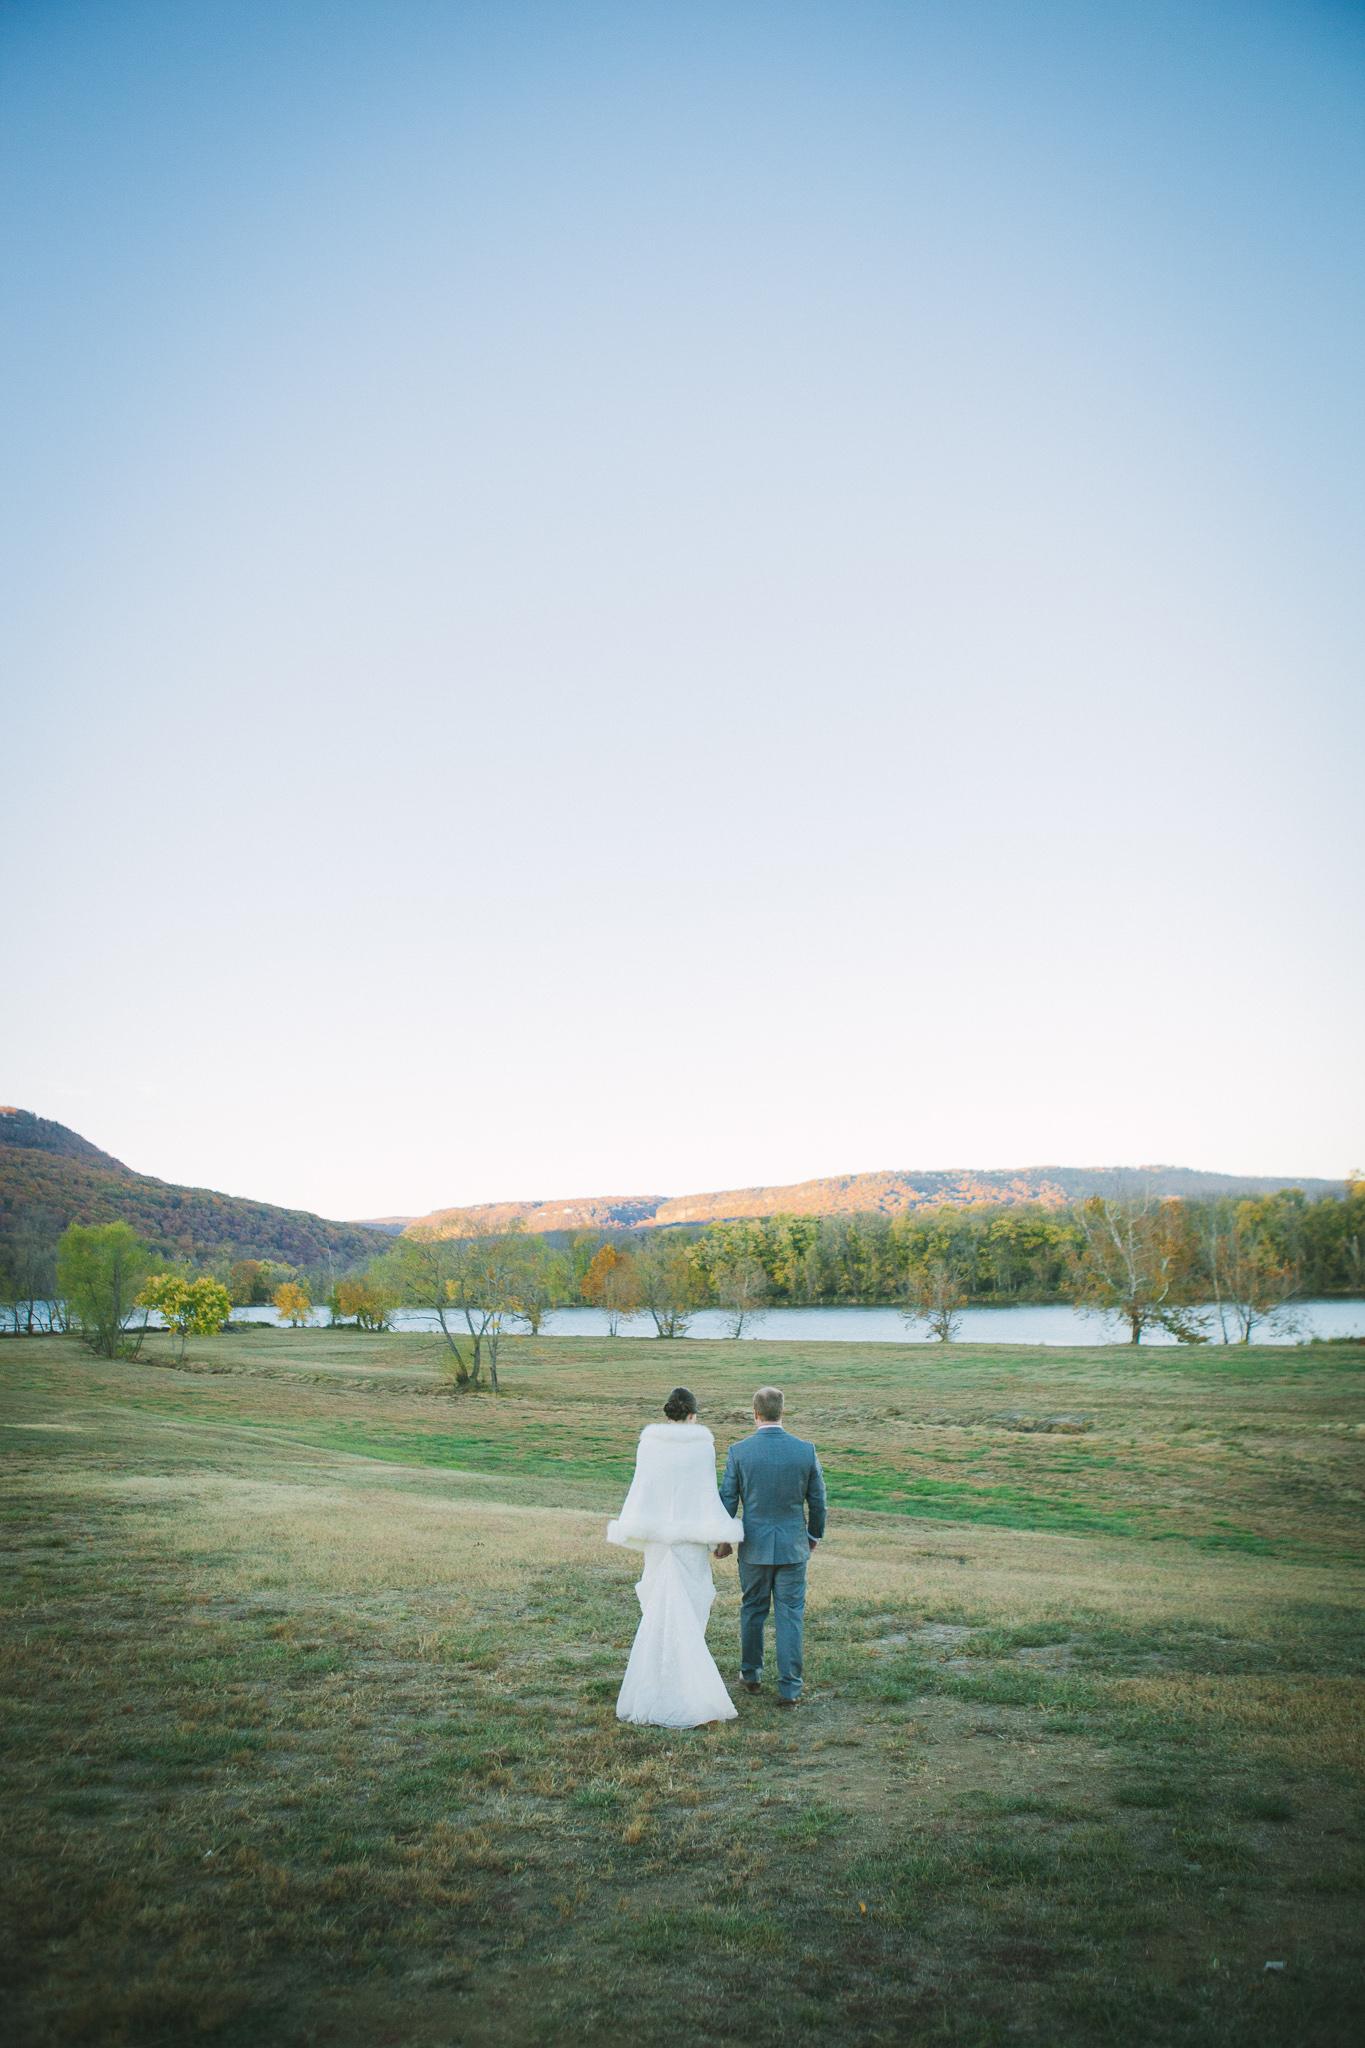 chattanooga-wedding-photographer-inimate-beautiful-tennessee-31.jpg